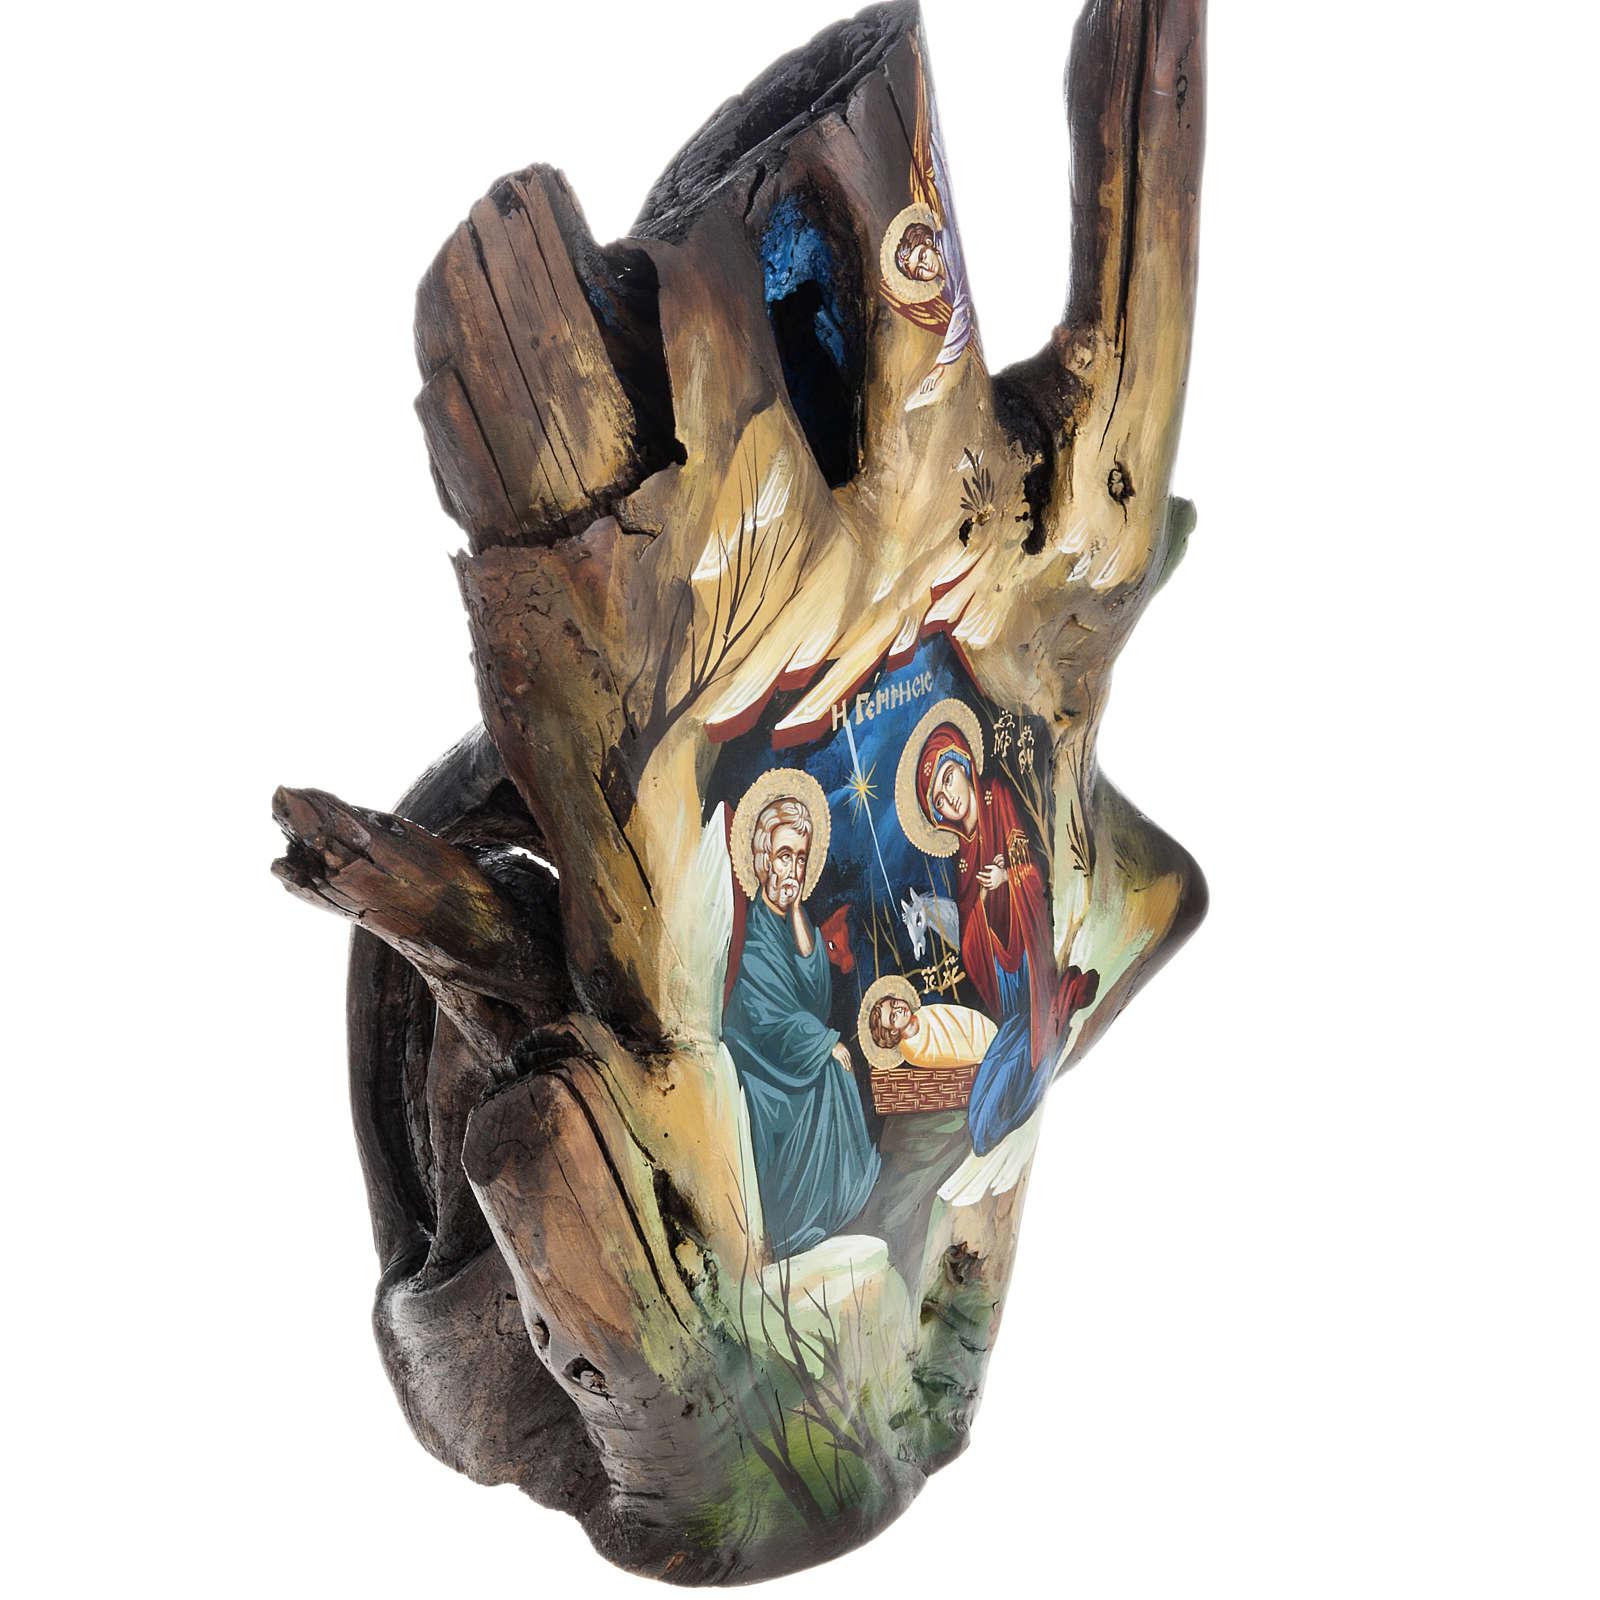 Icona dipinta su tronco 50x30 cm 4